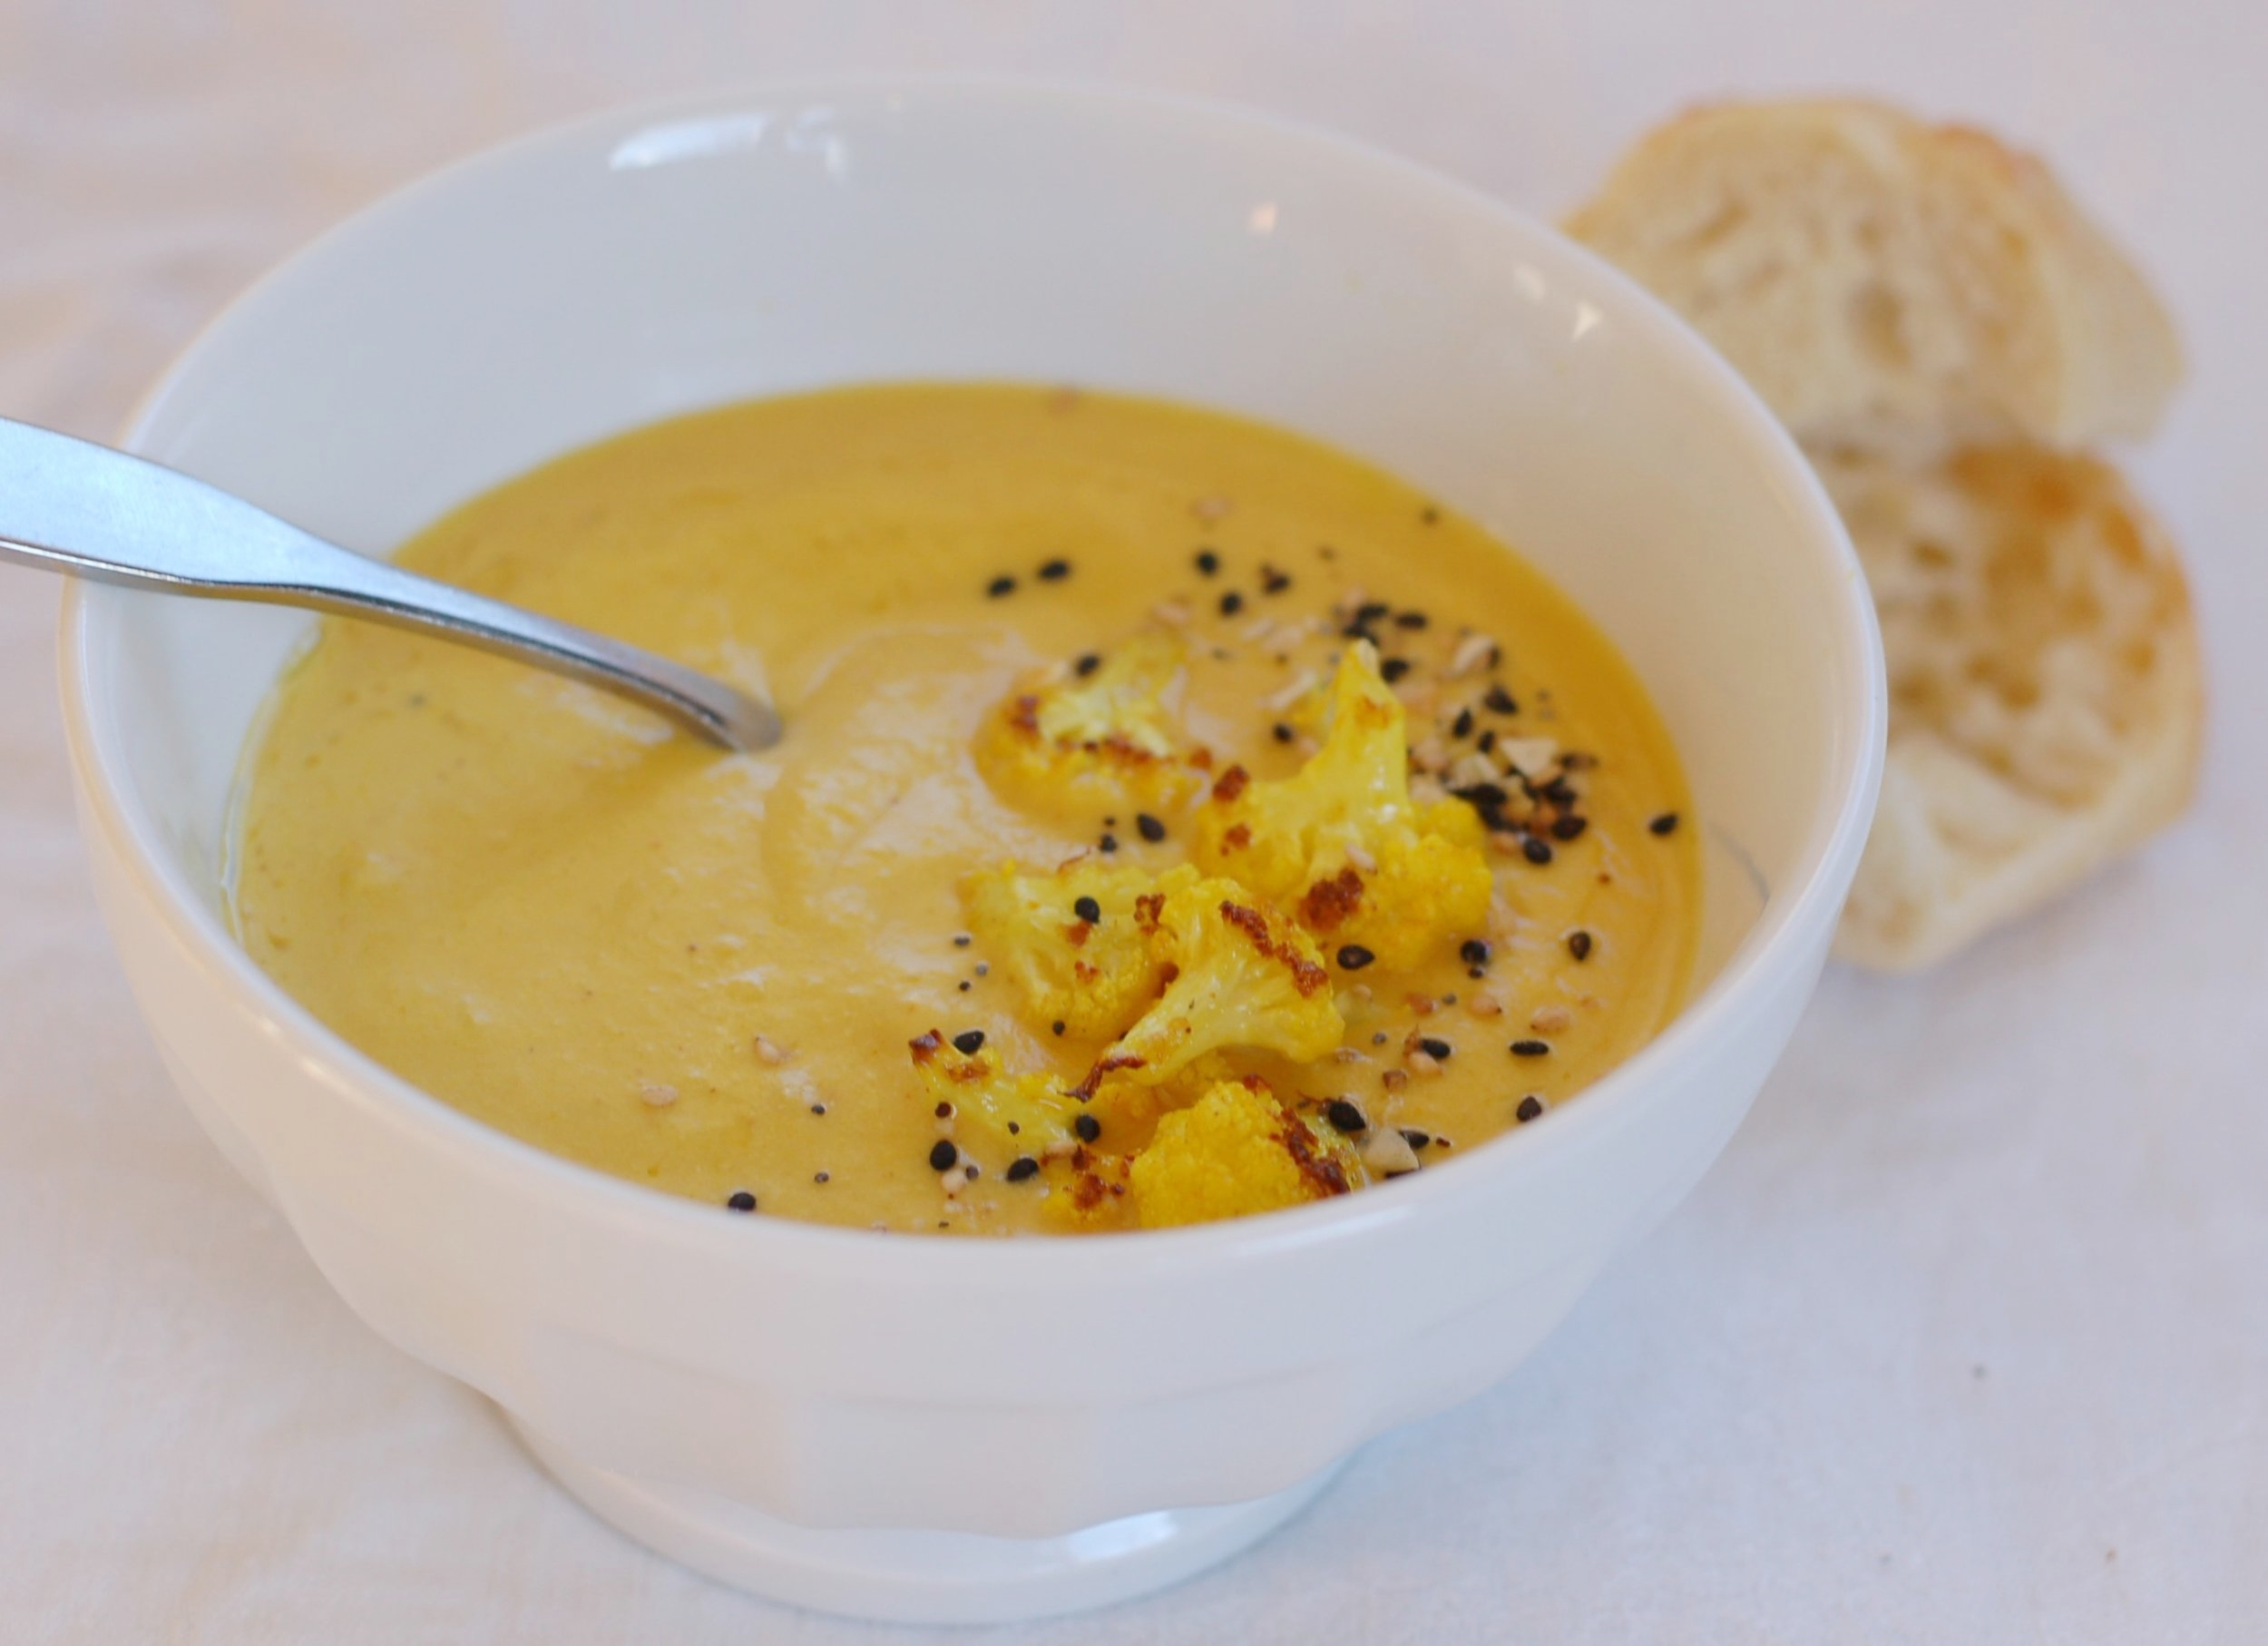 Roasted Cauliflower and Turmeric Soup